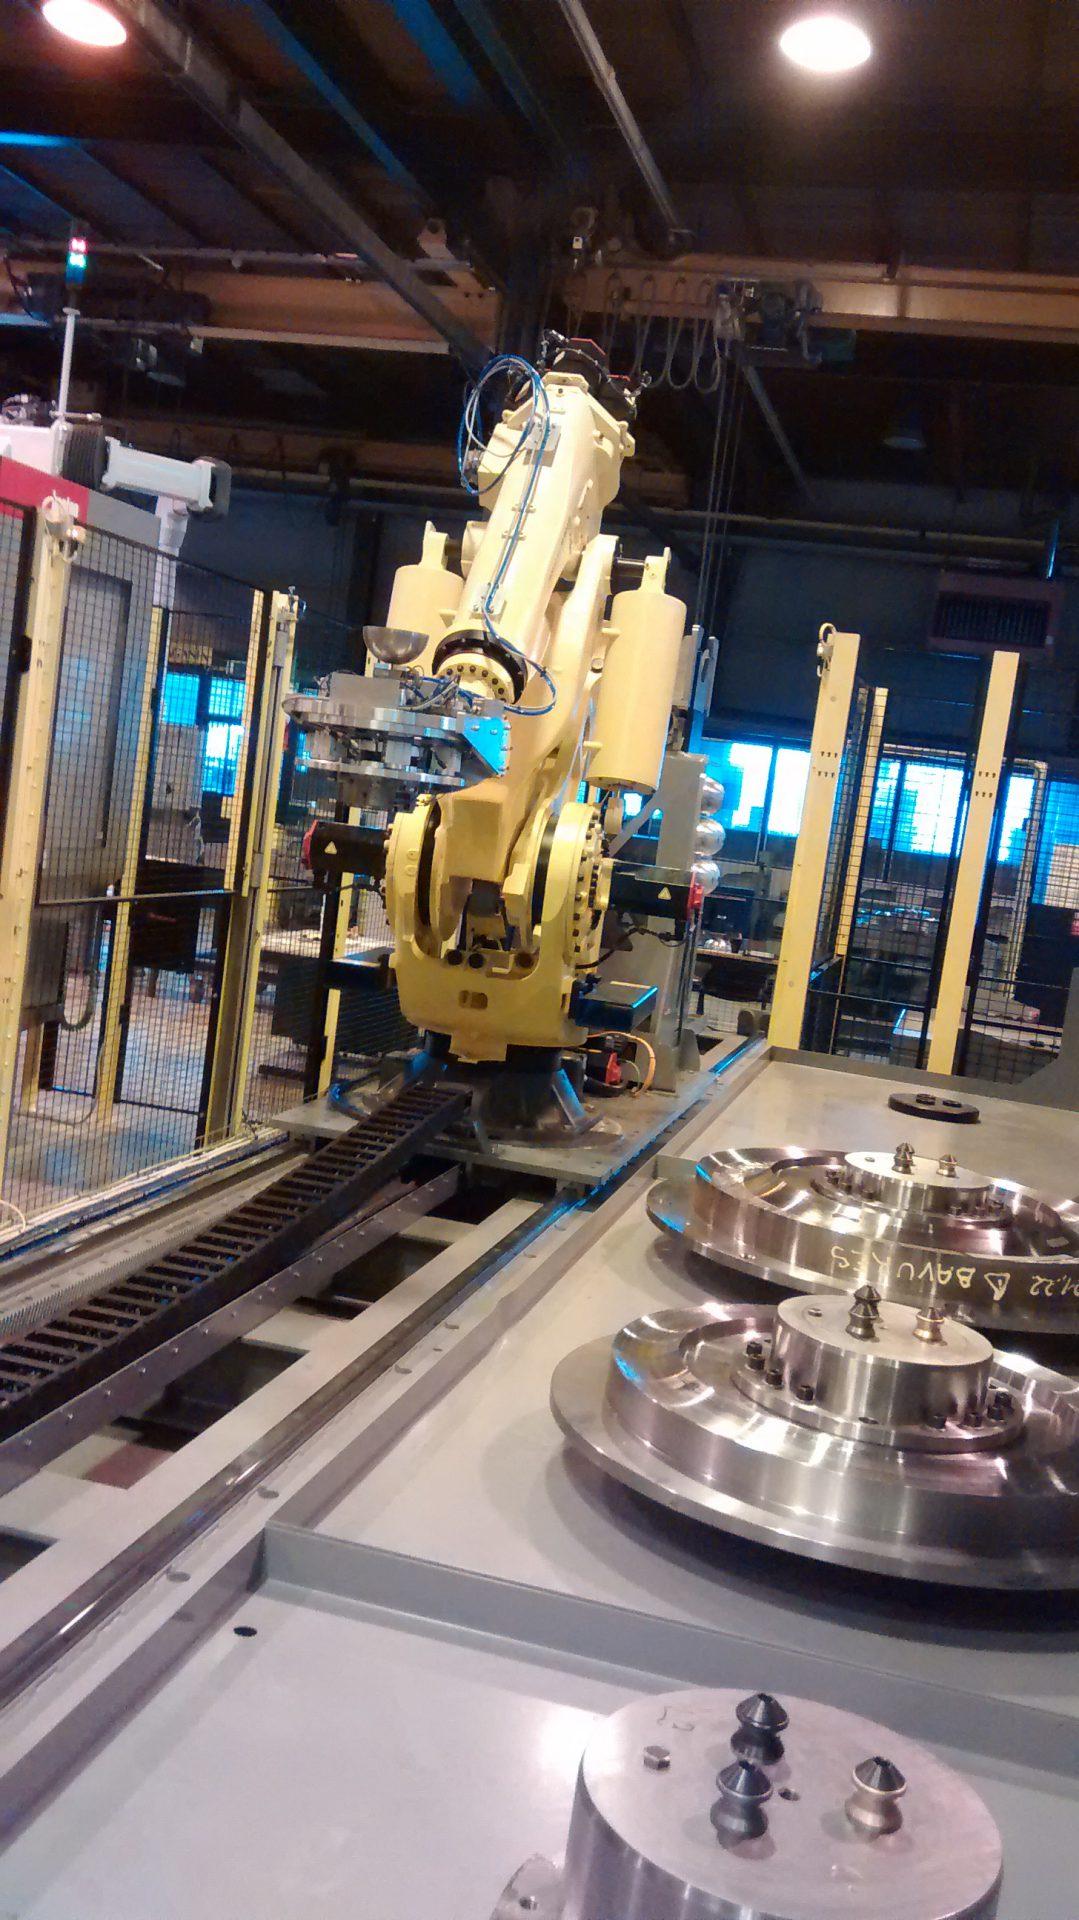 Robottracks